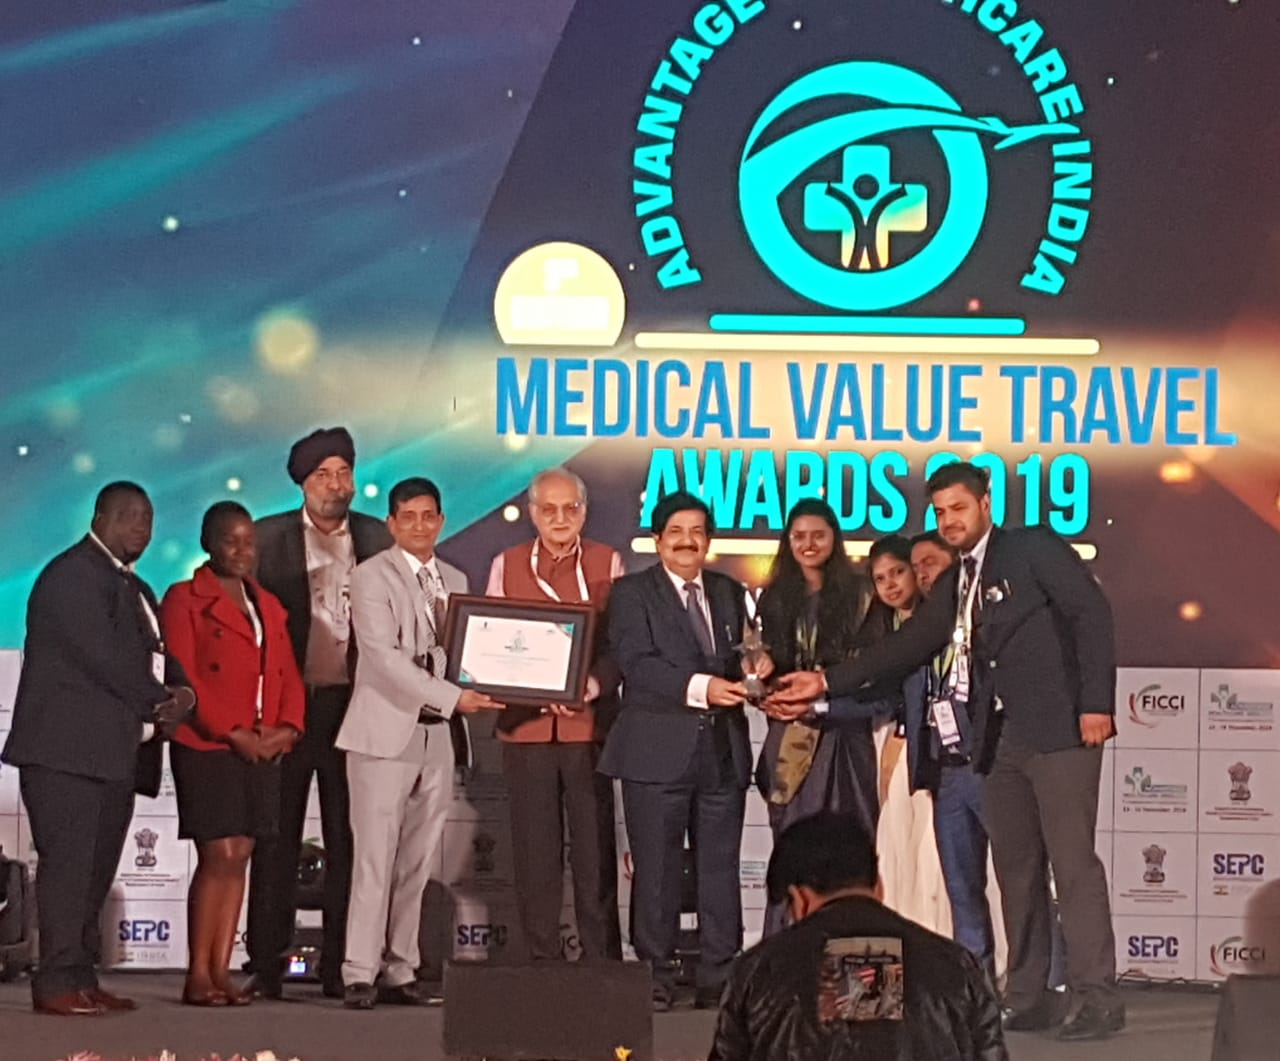 HBG-Medical-Assistance-recognised-at-2019's-Medical-Travel-Value-Awards